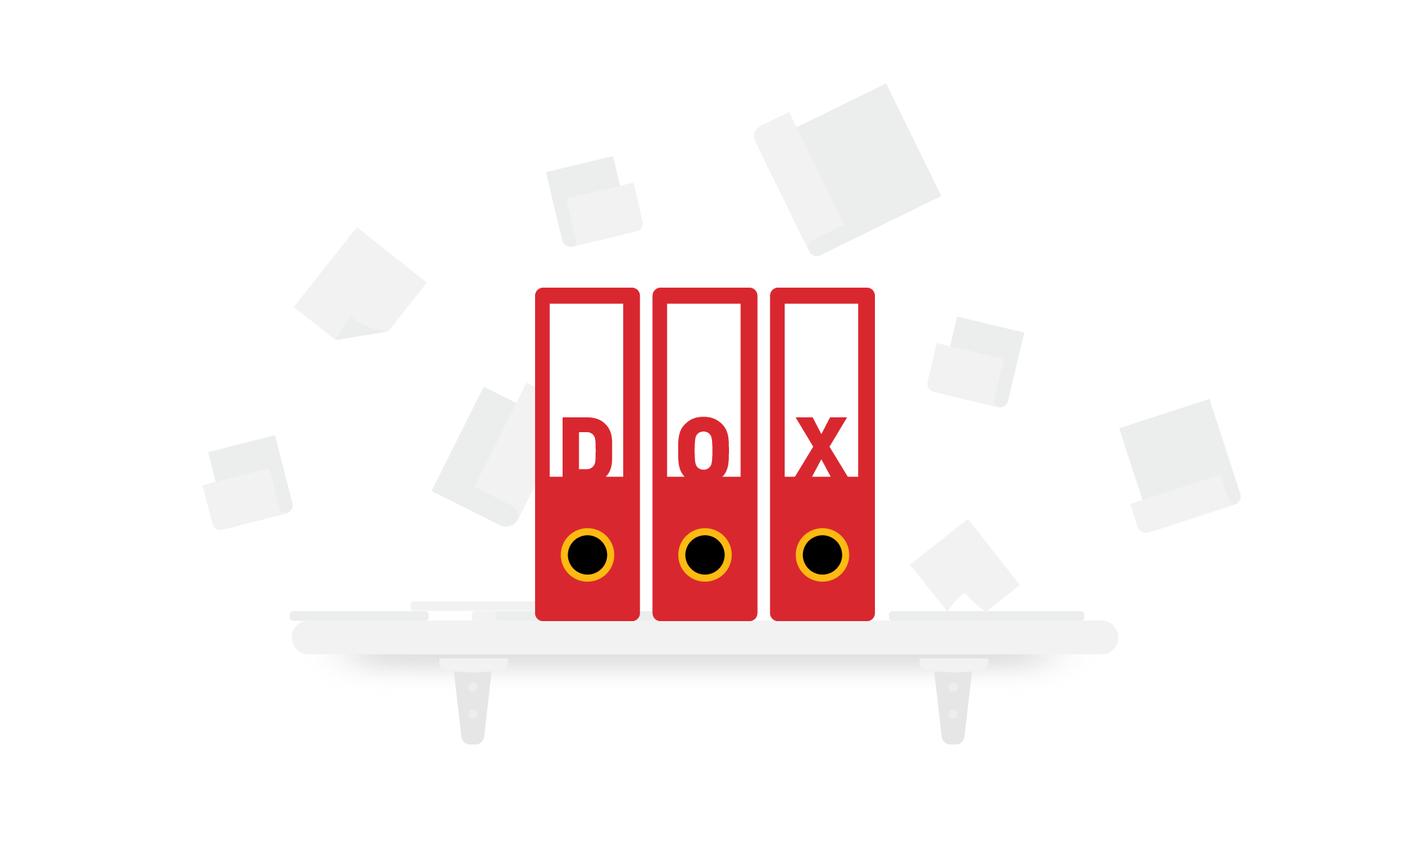 Automate your API documentation